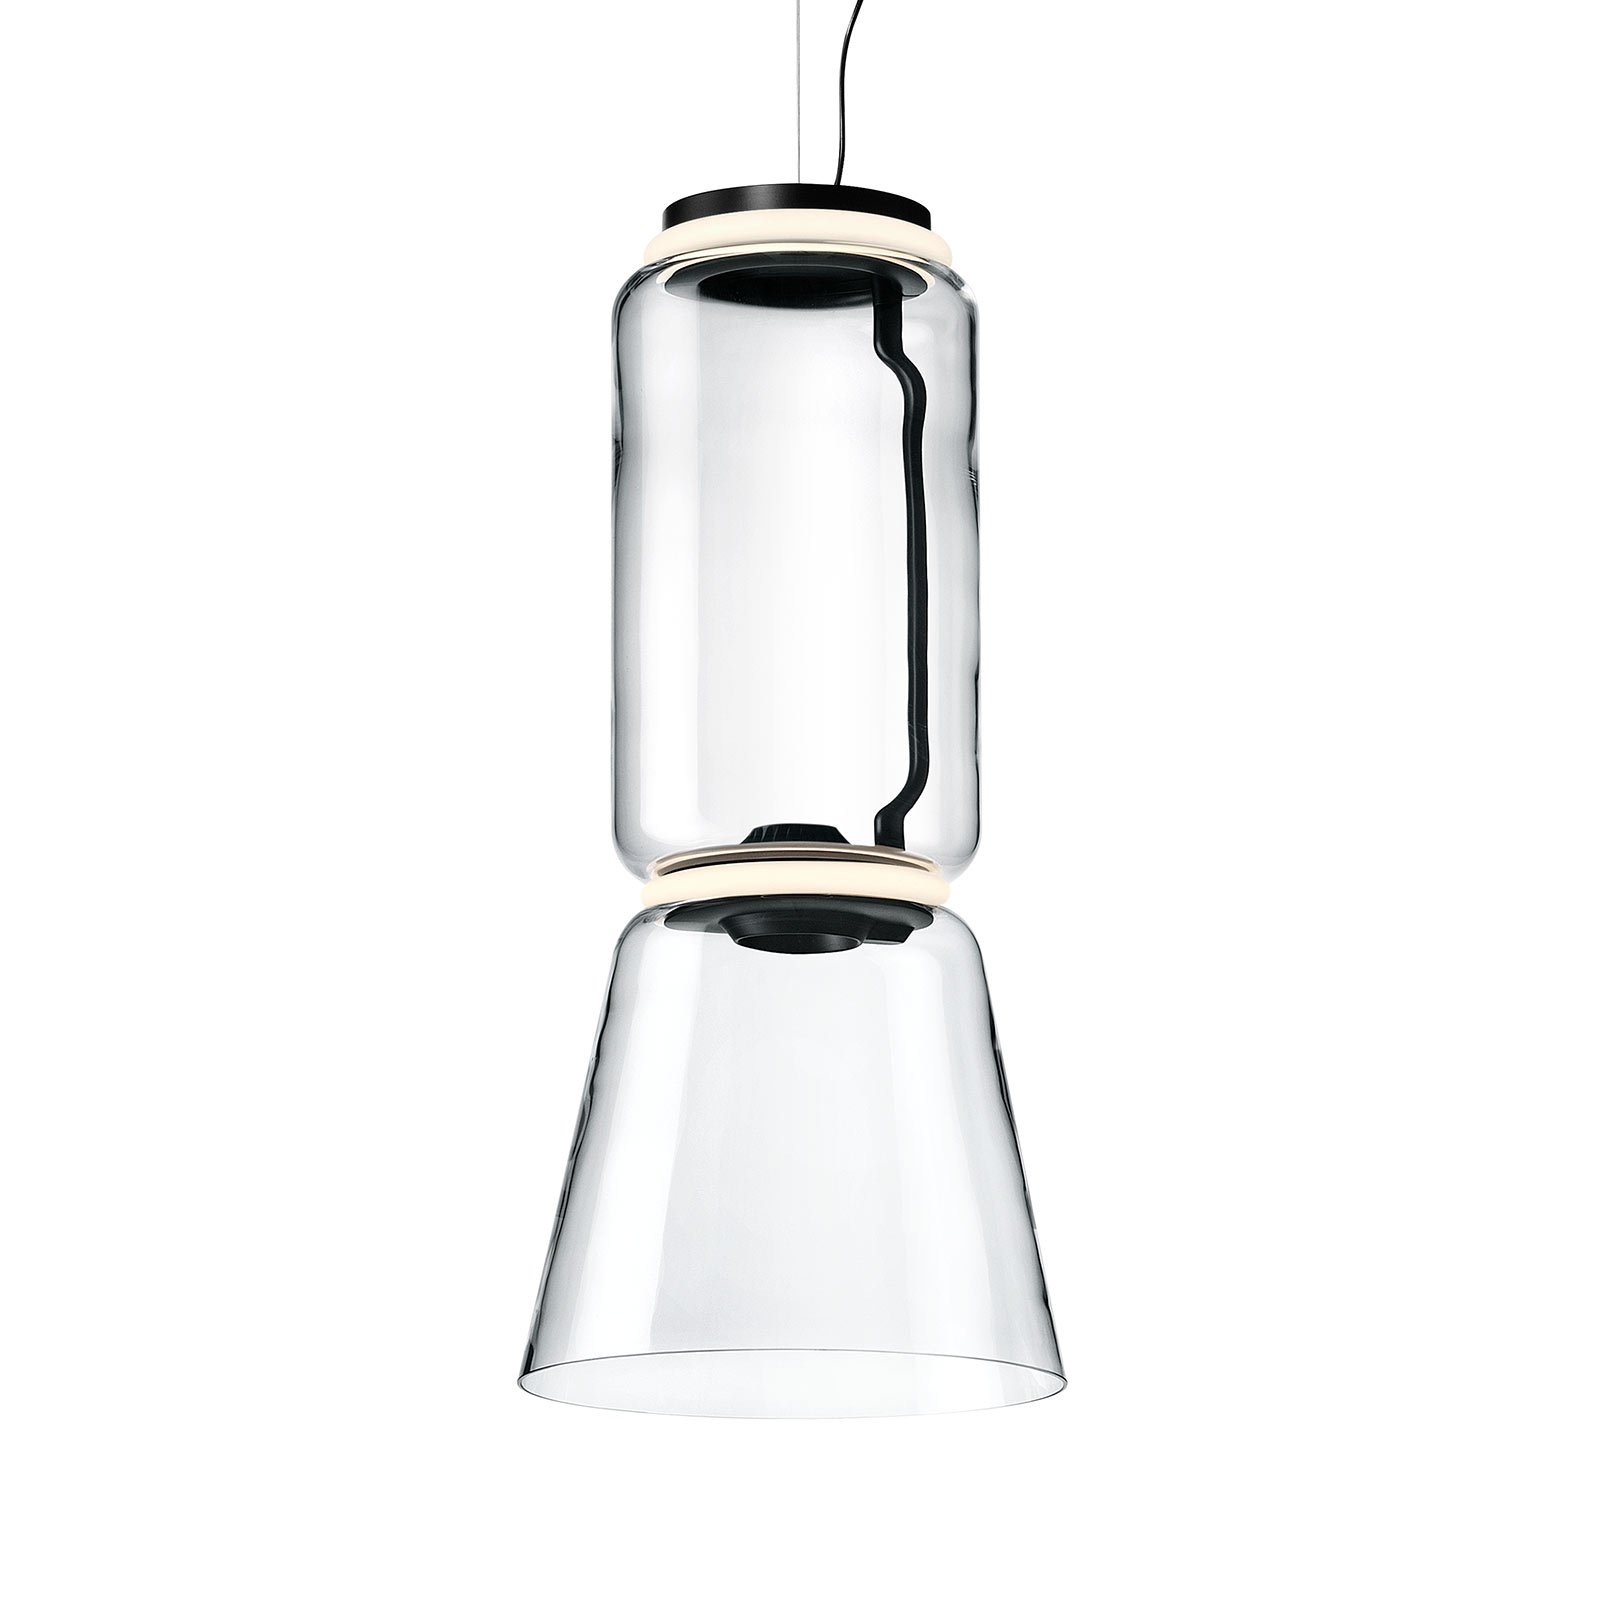 FLOS Noctambule -riippuvalo 1 Low Cylinder & Cone